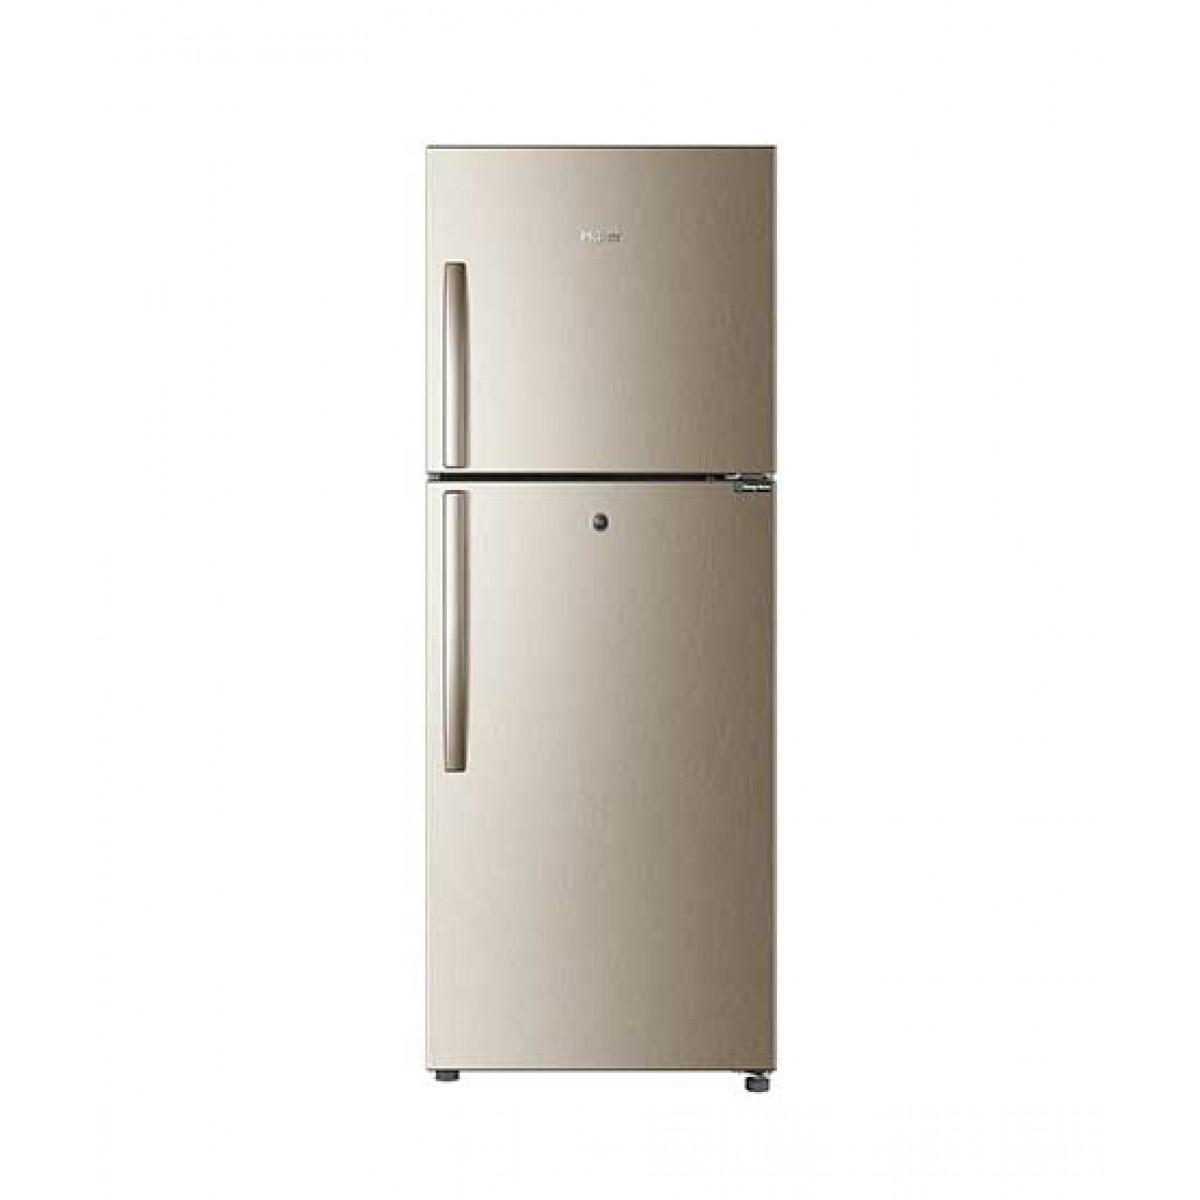 Haier E-Star Freezer-On-Top Refrigerator 10 Cu Ft (HRF-306ECD)